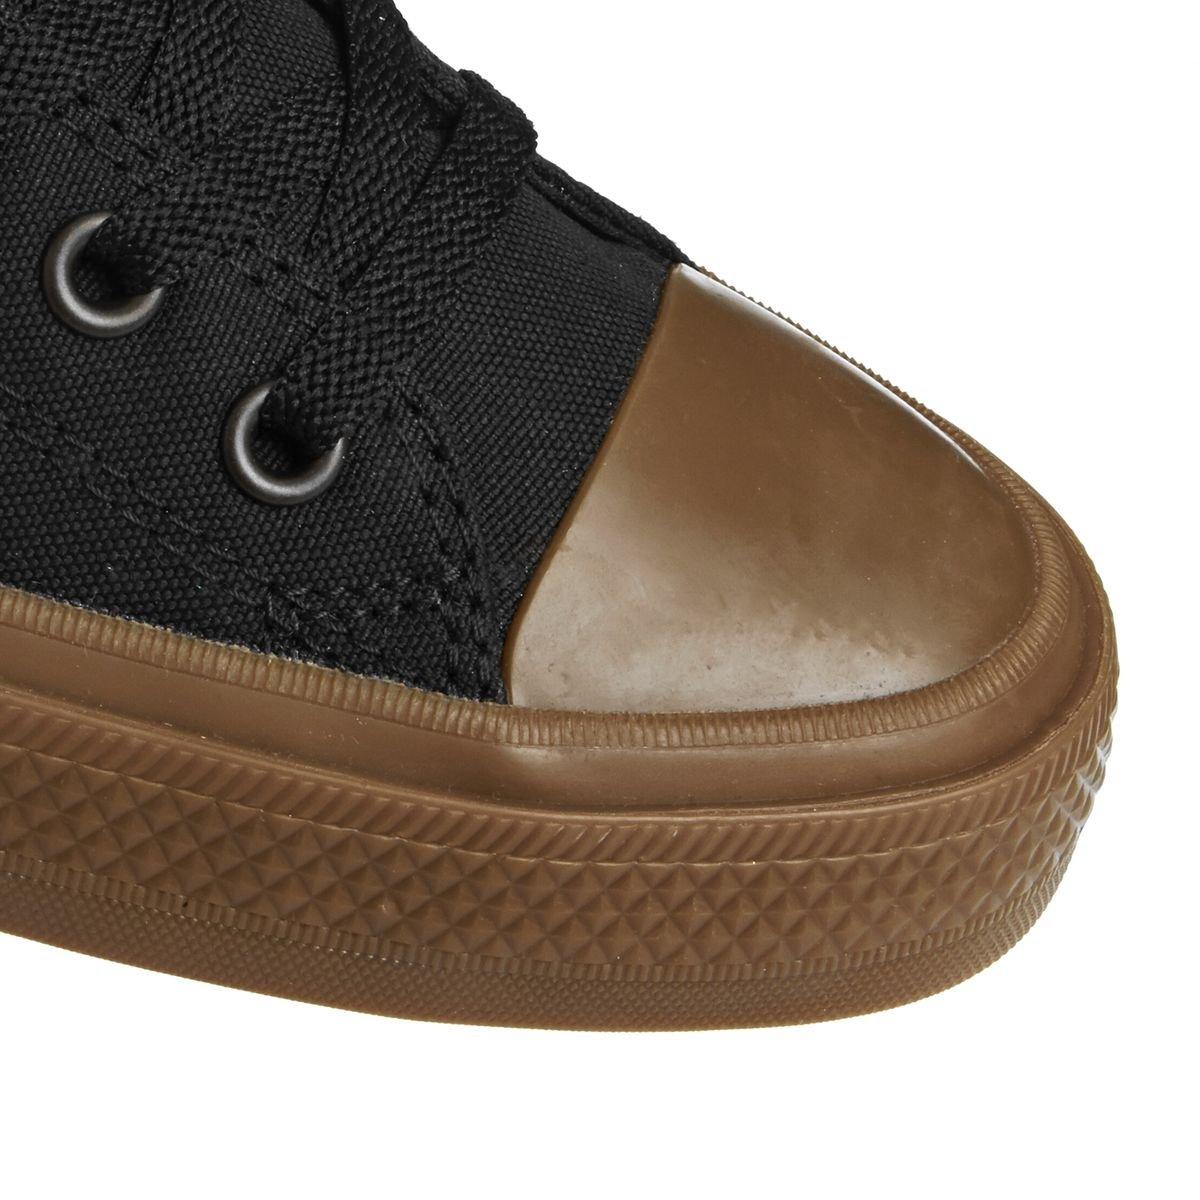 e324f47bd27f Converse Unisex Adults Chuck Taylor All Star Ii Reflective Camo Hi-Top  Sneakers 150143C